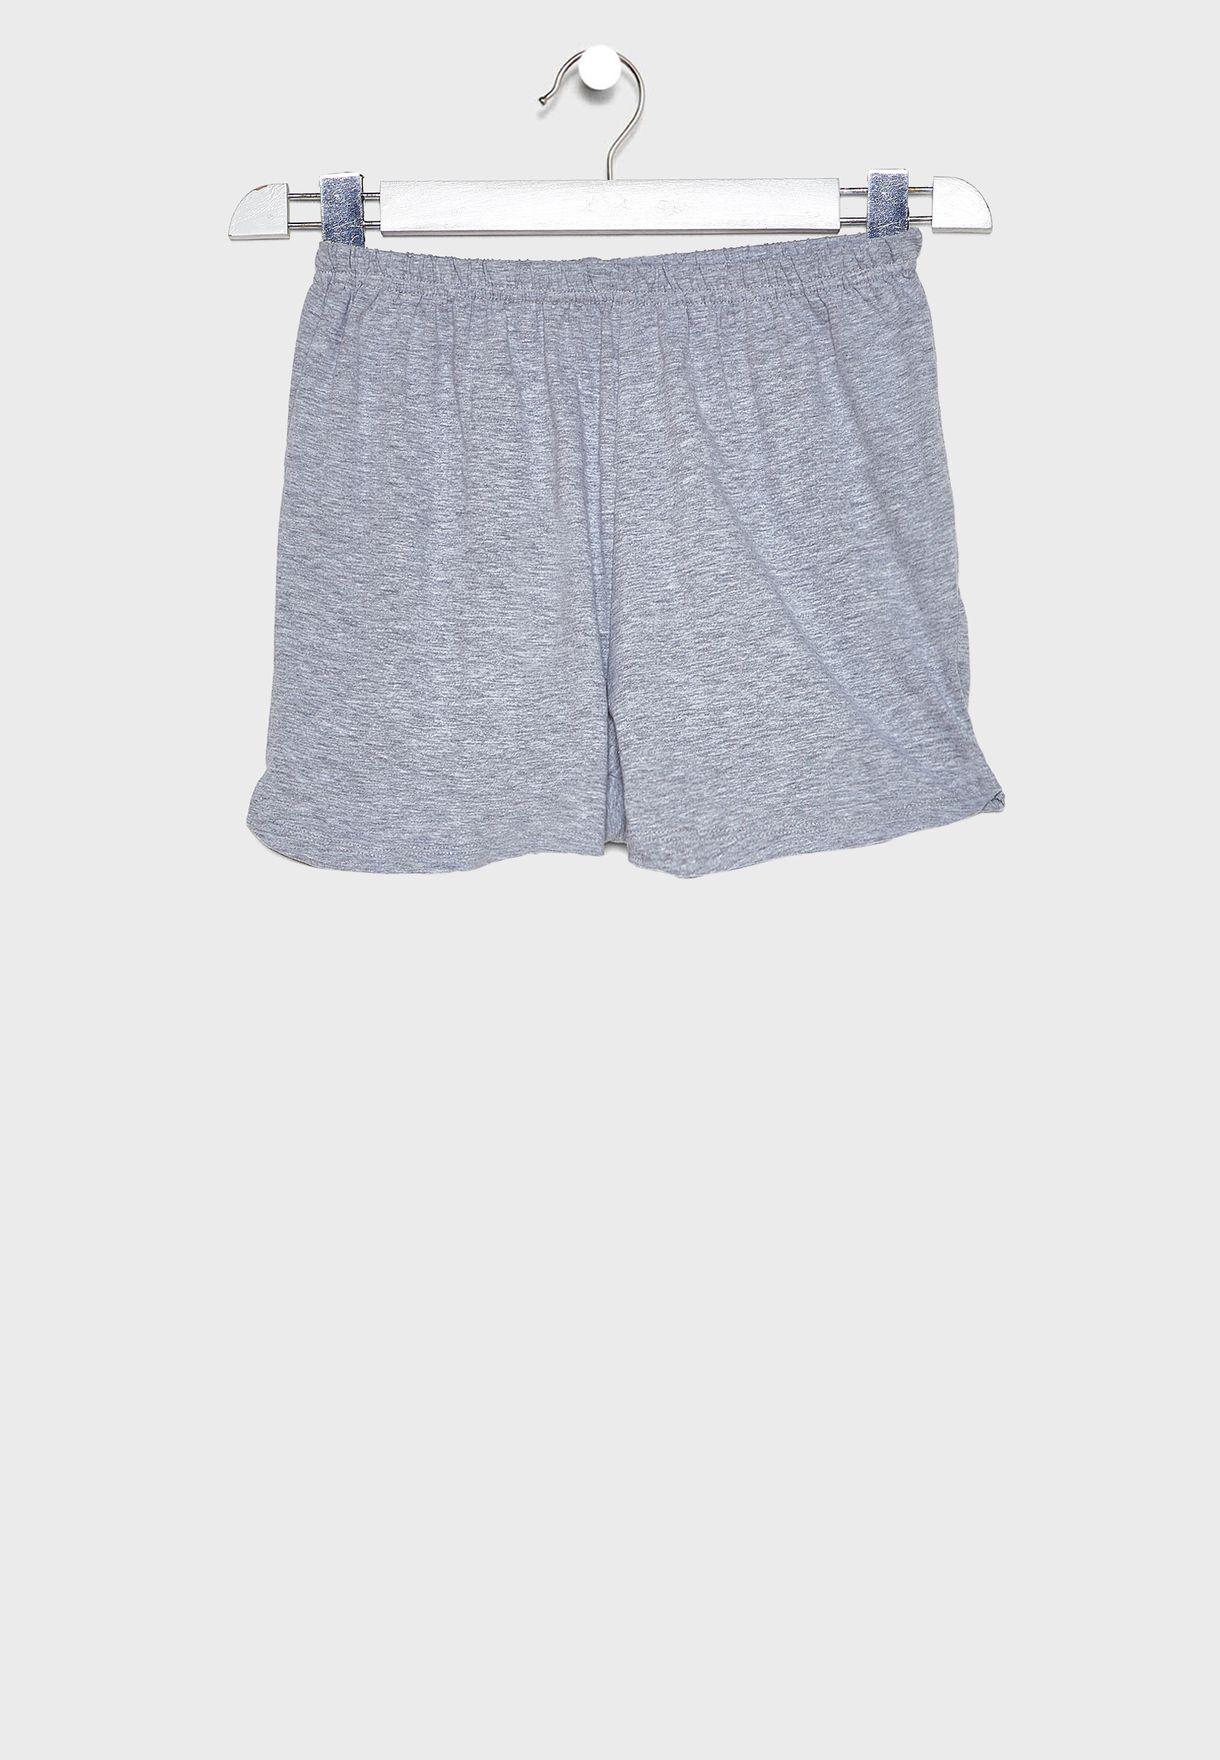 Infant Graphic Top + Short Pyjama Set